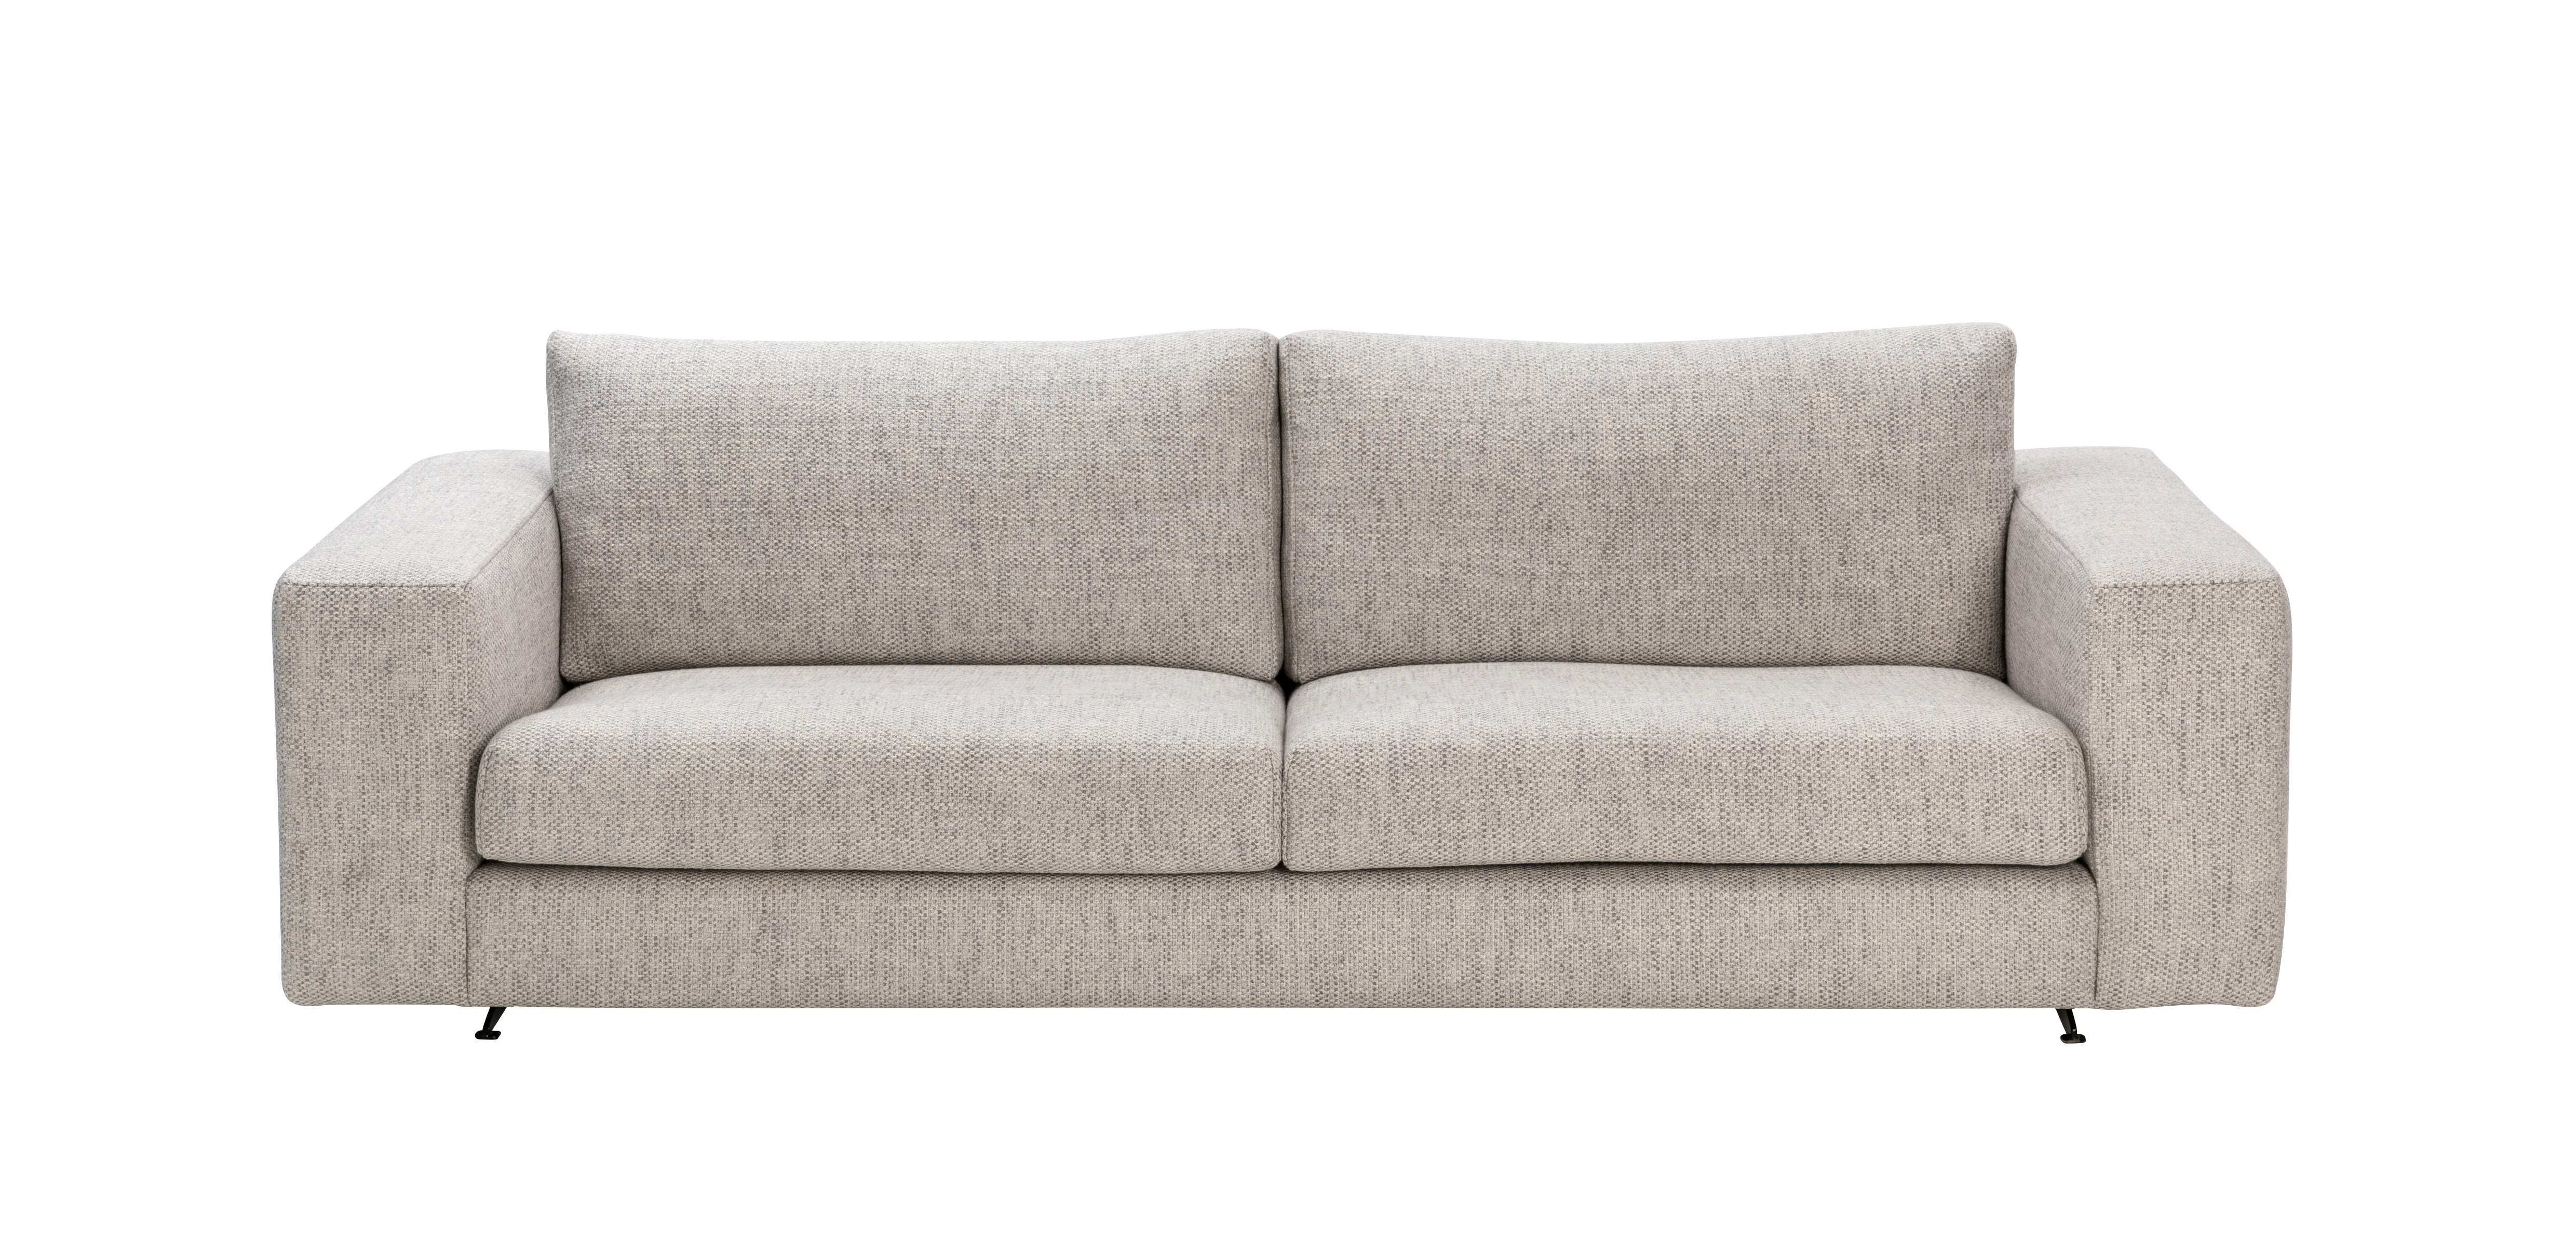 Benson couch